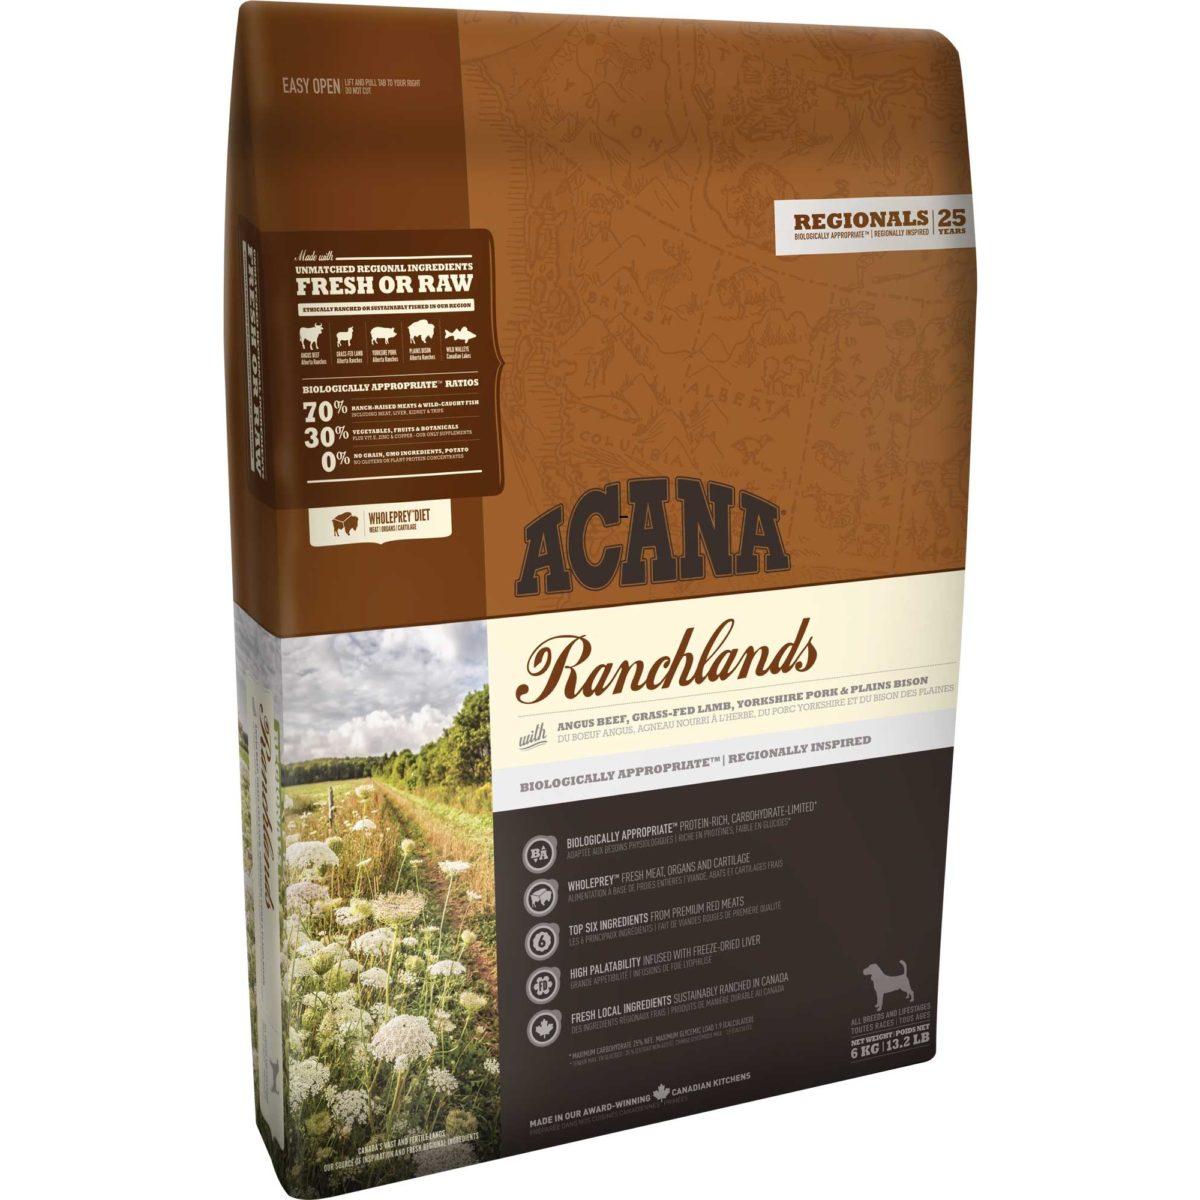 ACANA Reg Ranchlands 11.4 Kg.